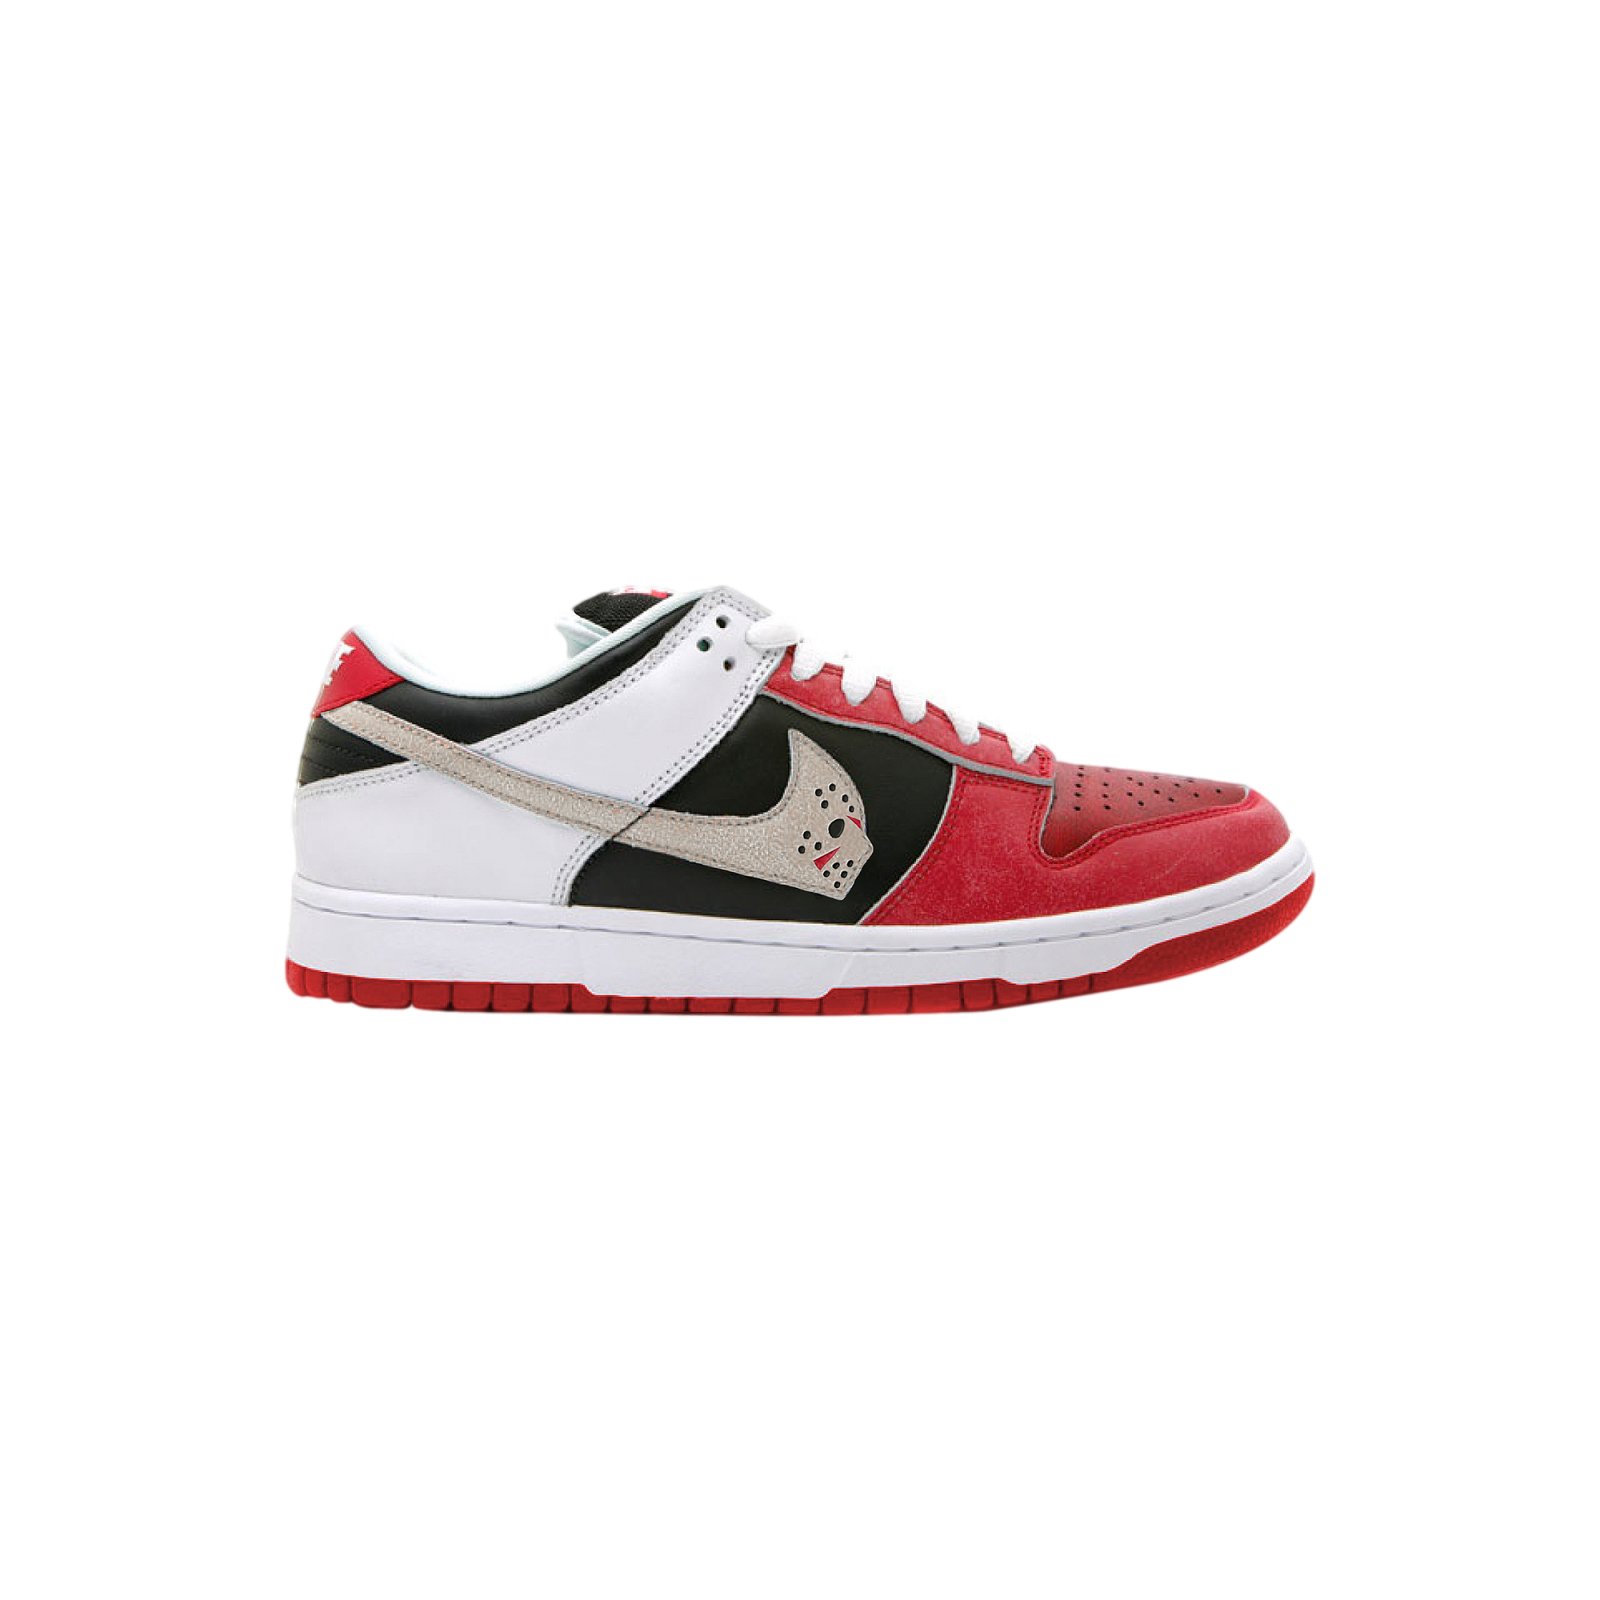 Jason-NikeSB-Dunk-Low.png